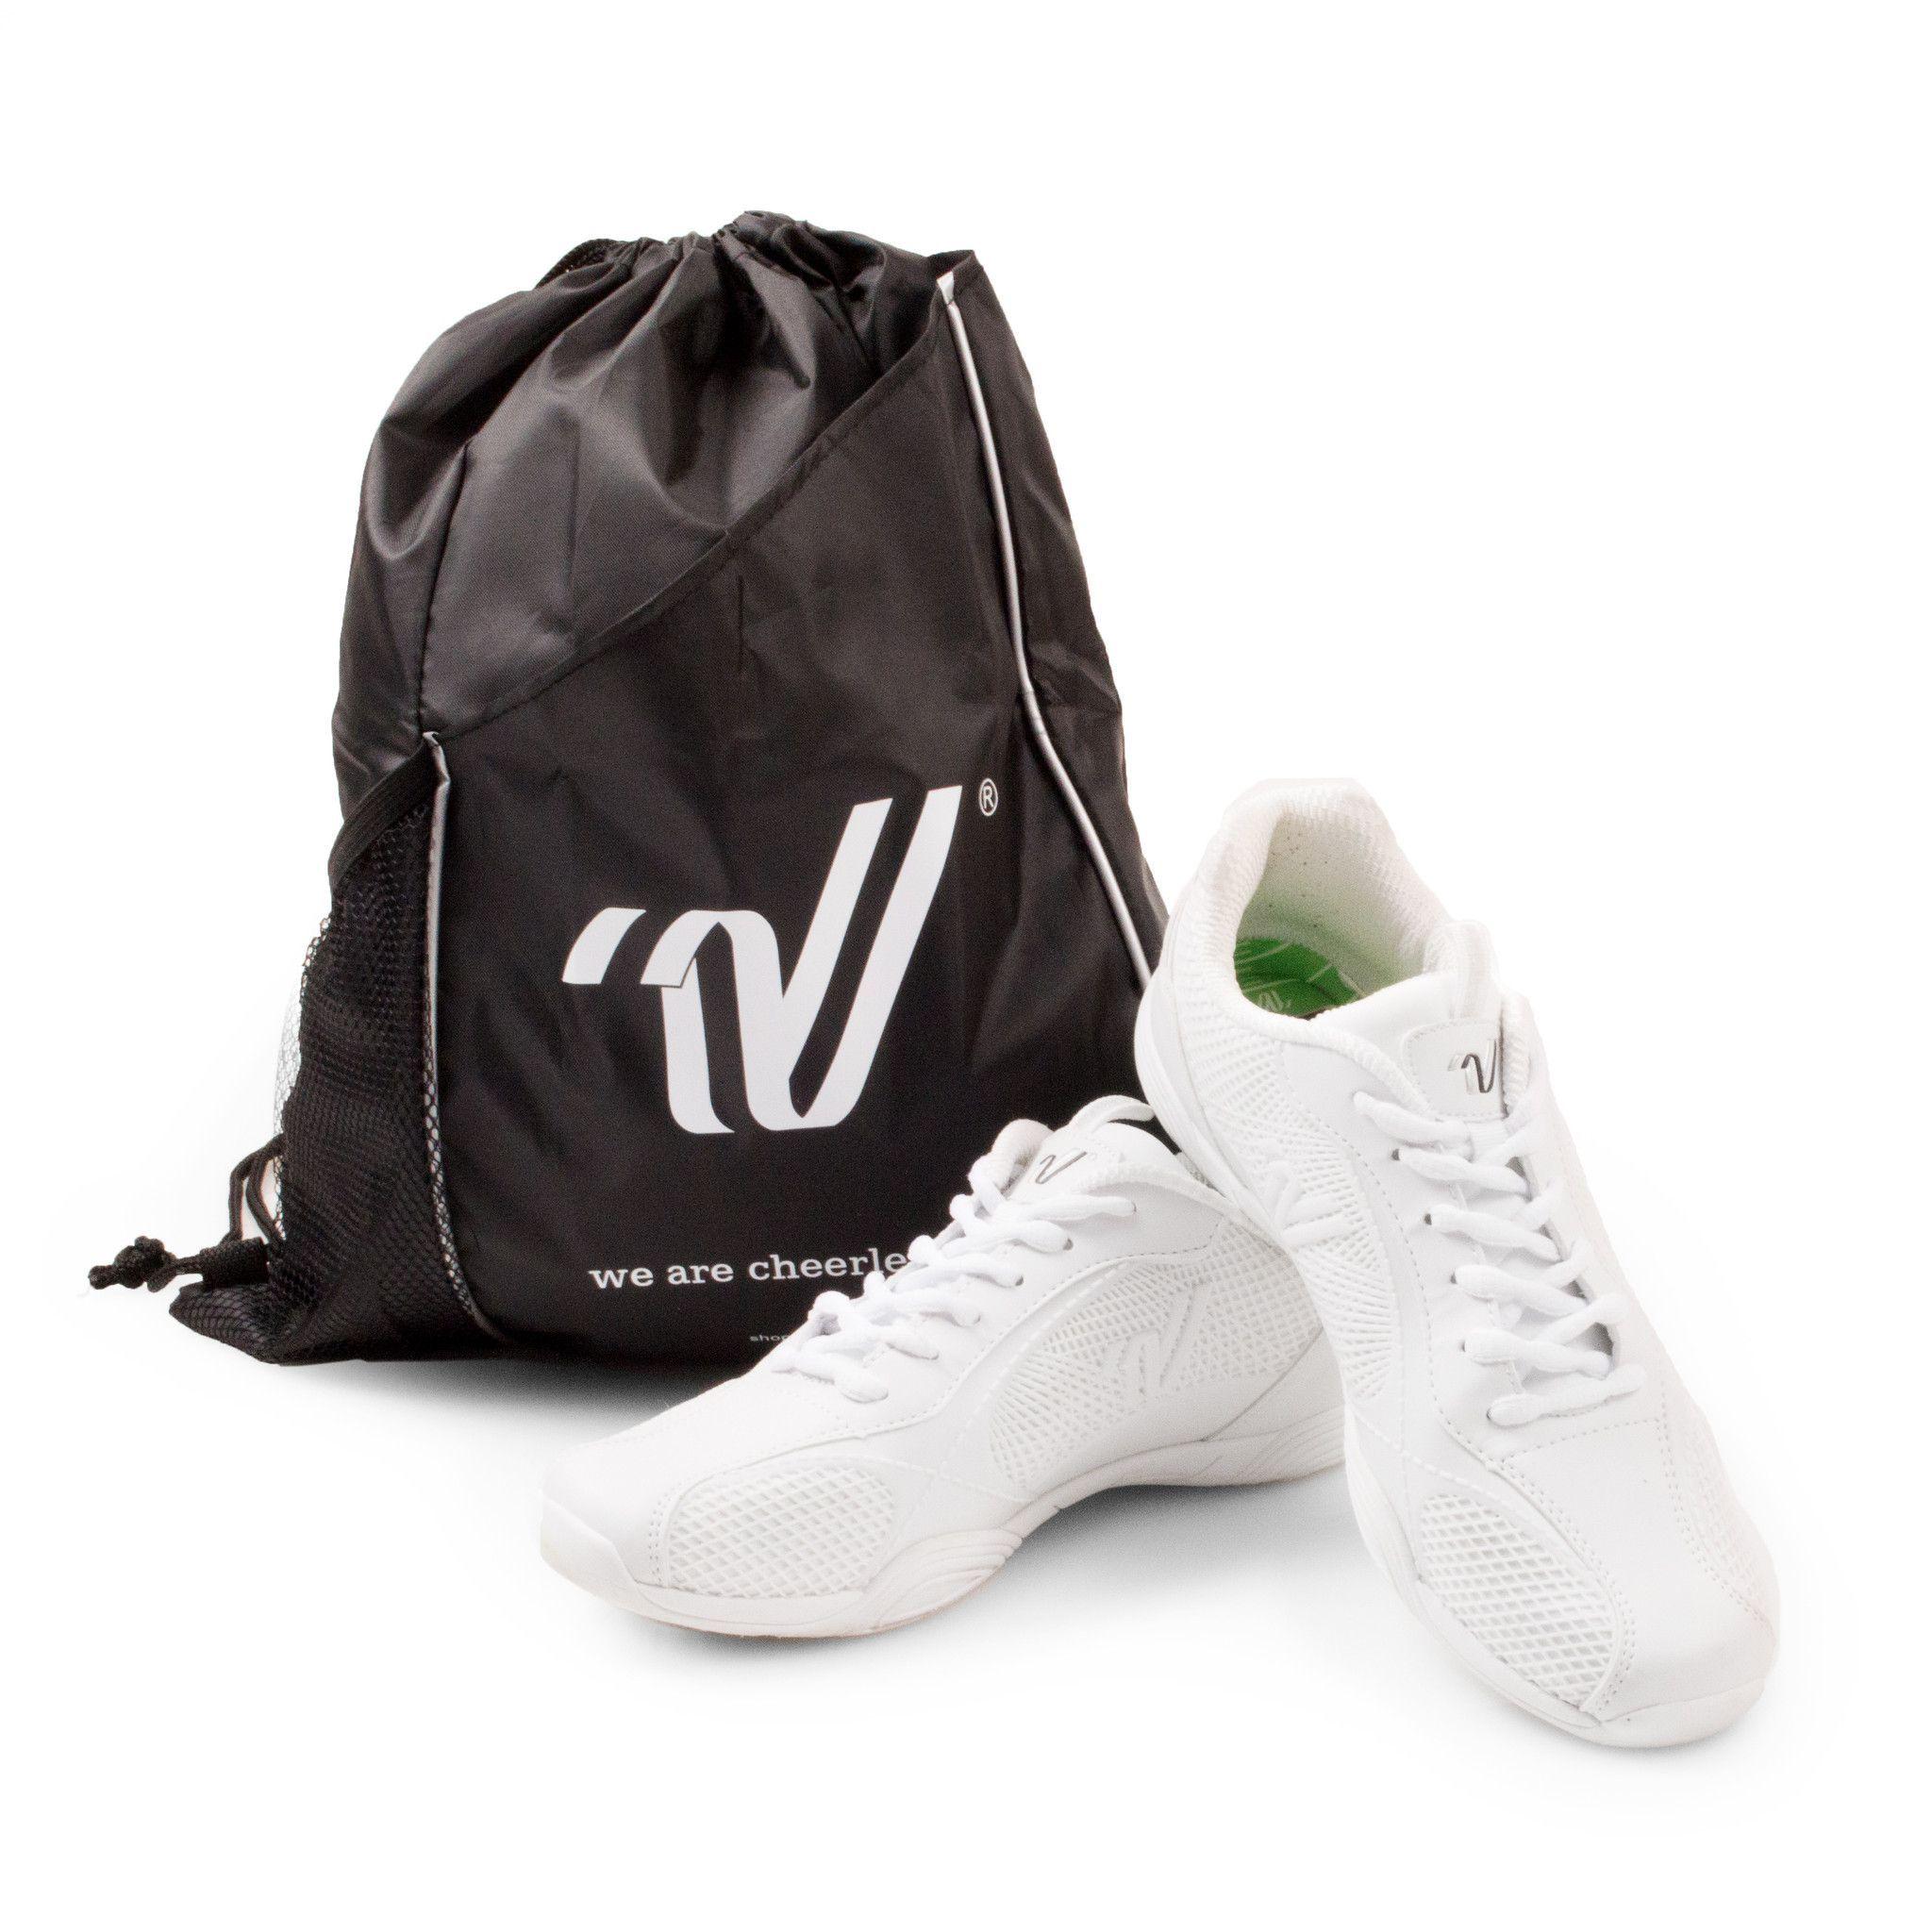 Varsity Gridiron Cheer Shoe | Cheer